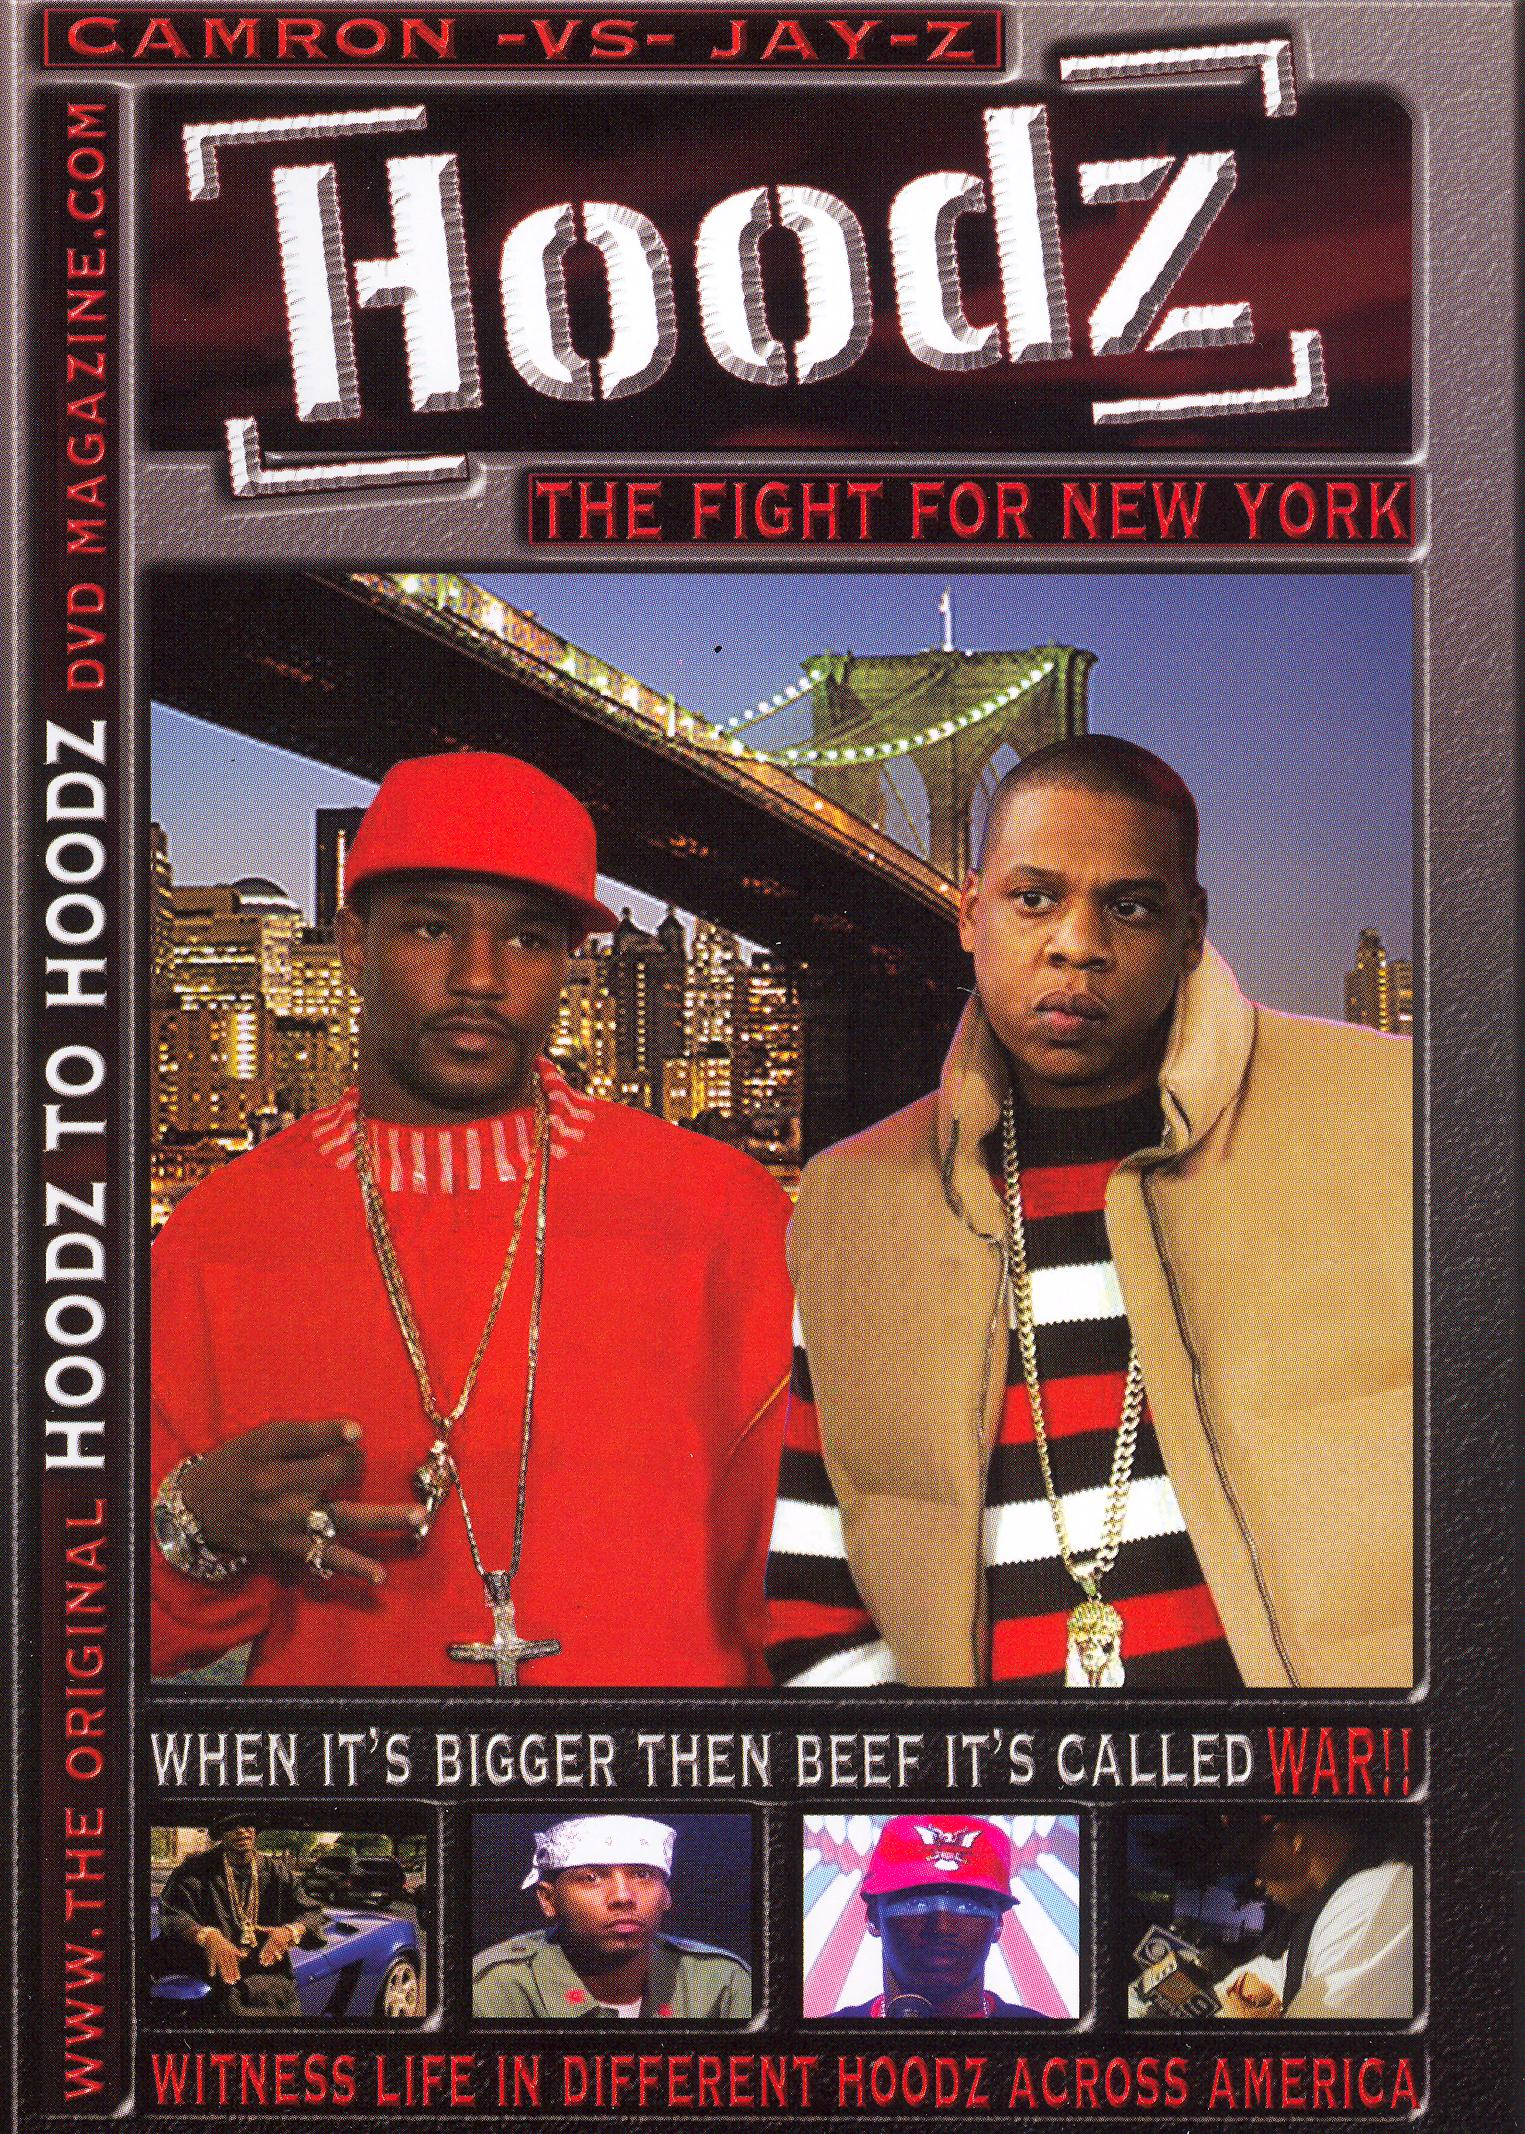 Hoodz DVD: Camron vs. Jay-Z - The Fight for New York